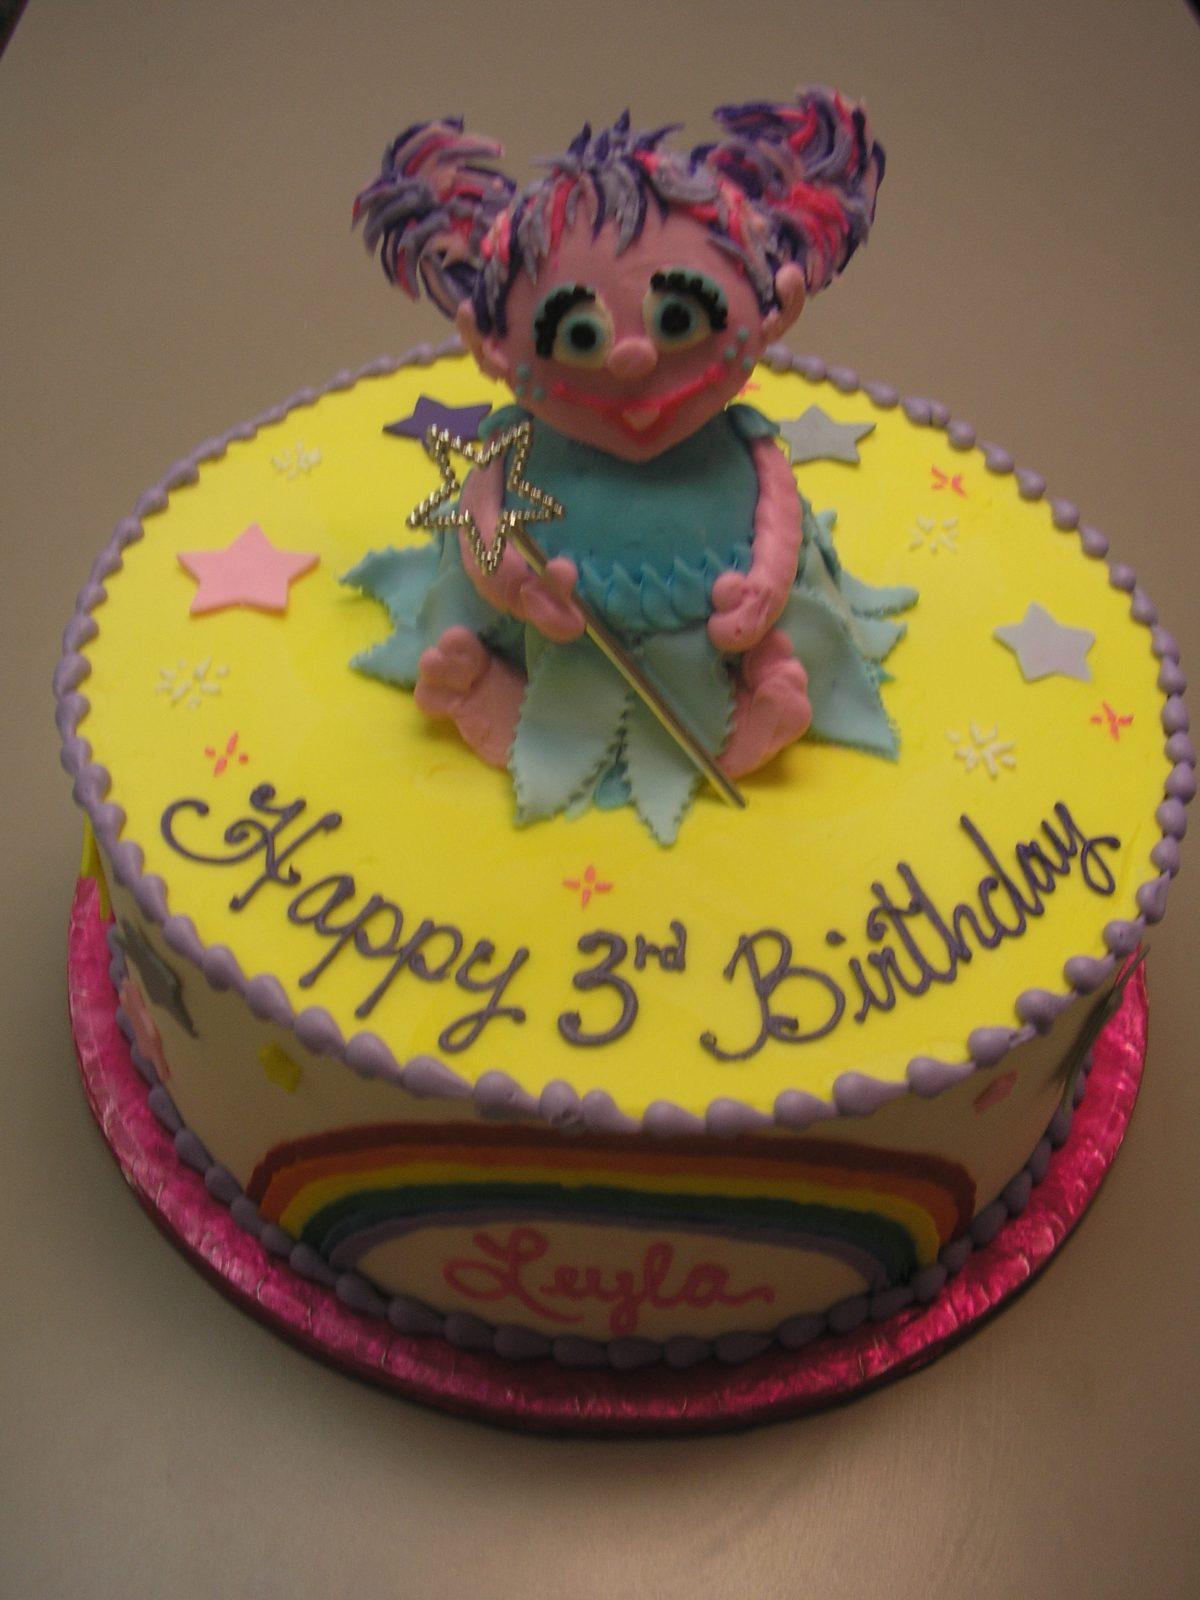 3D cake, Abby Cadabby, Sesame Street cake